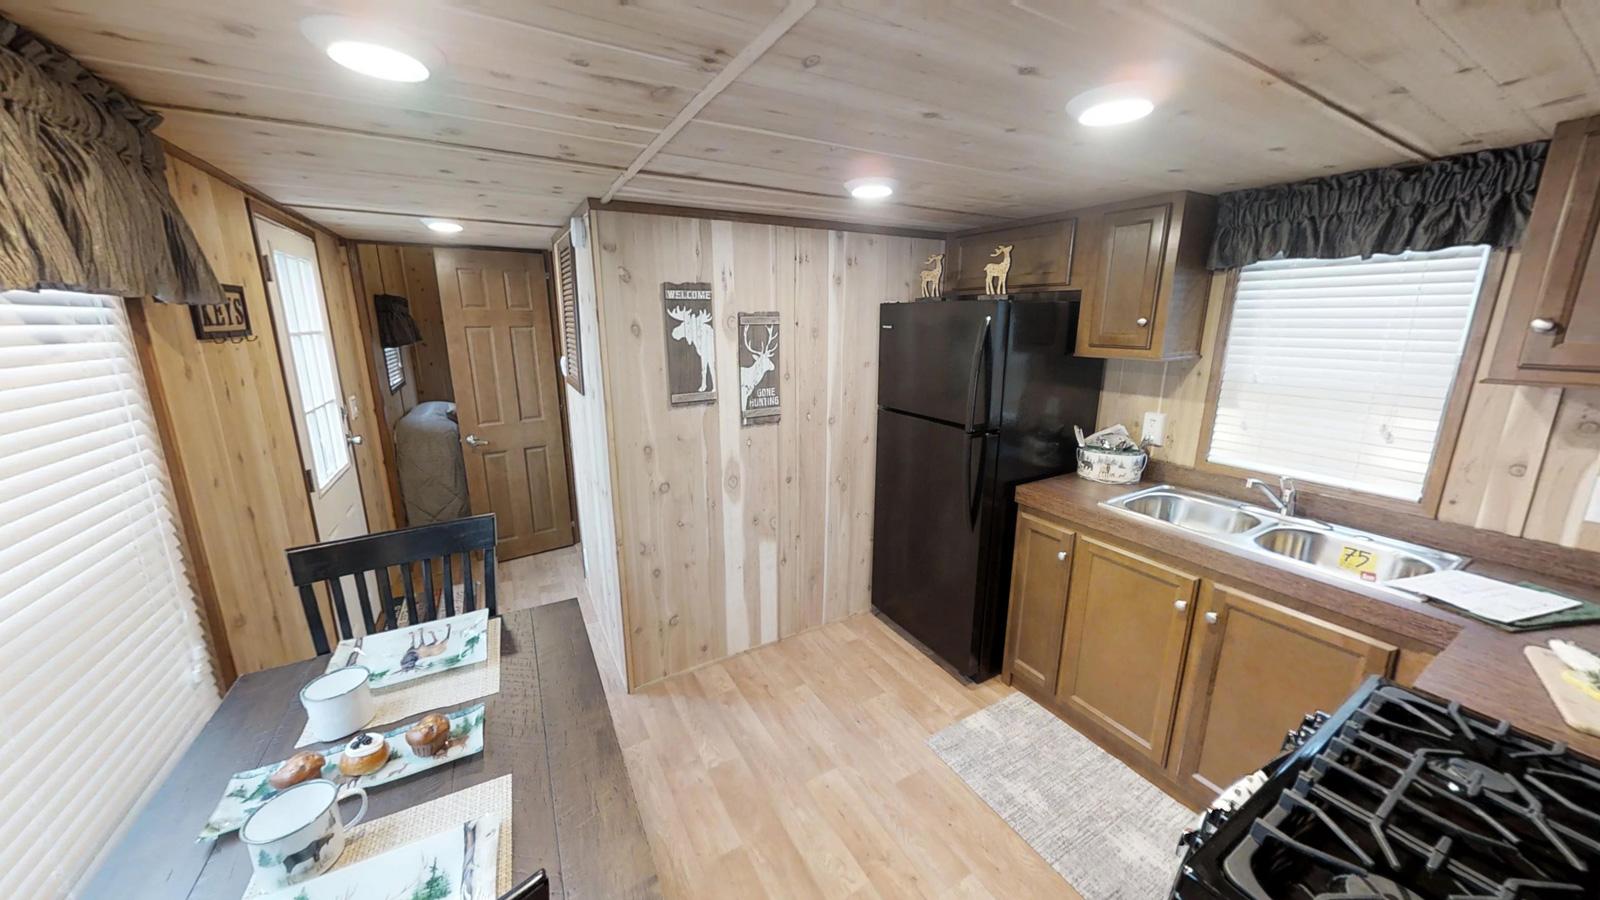 Americas-Park-Cabins-Lodge-Series-39-ND-10052018_095530